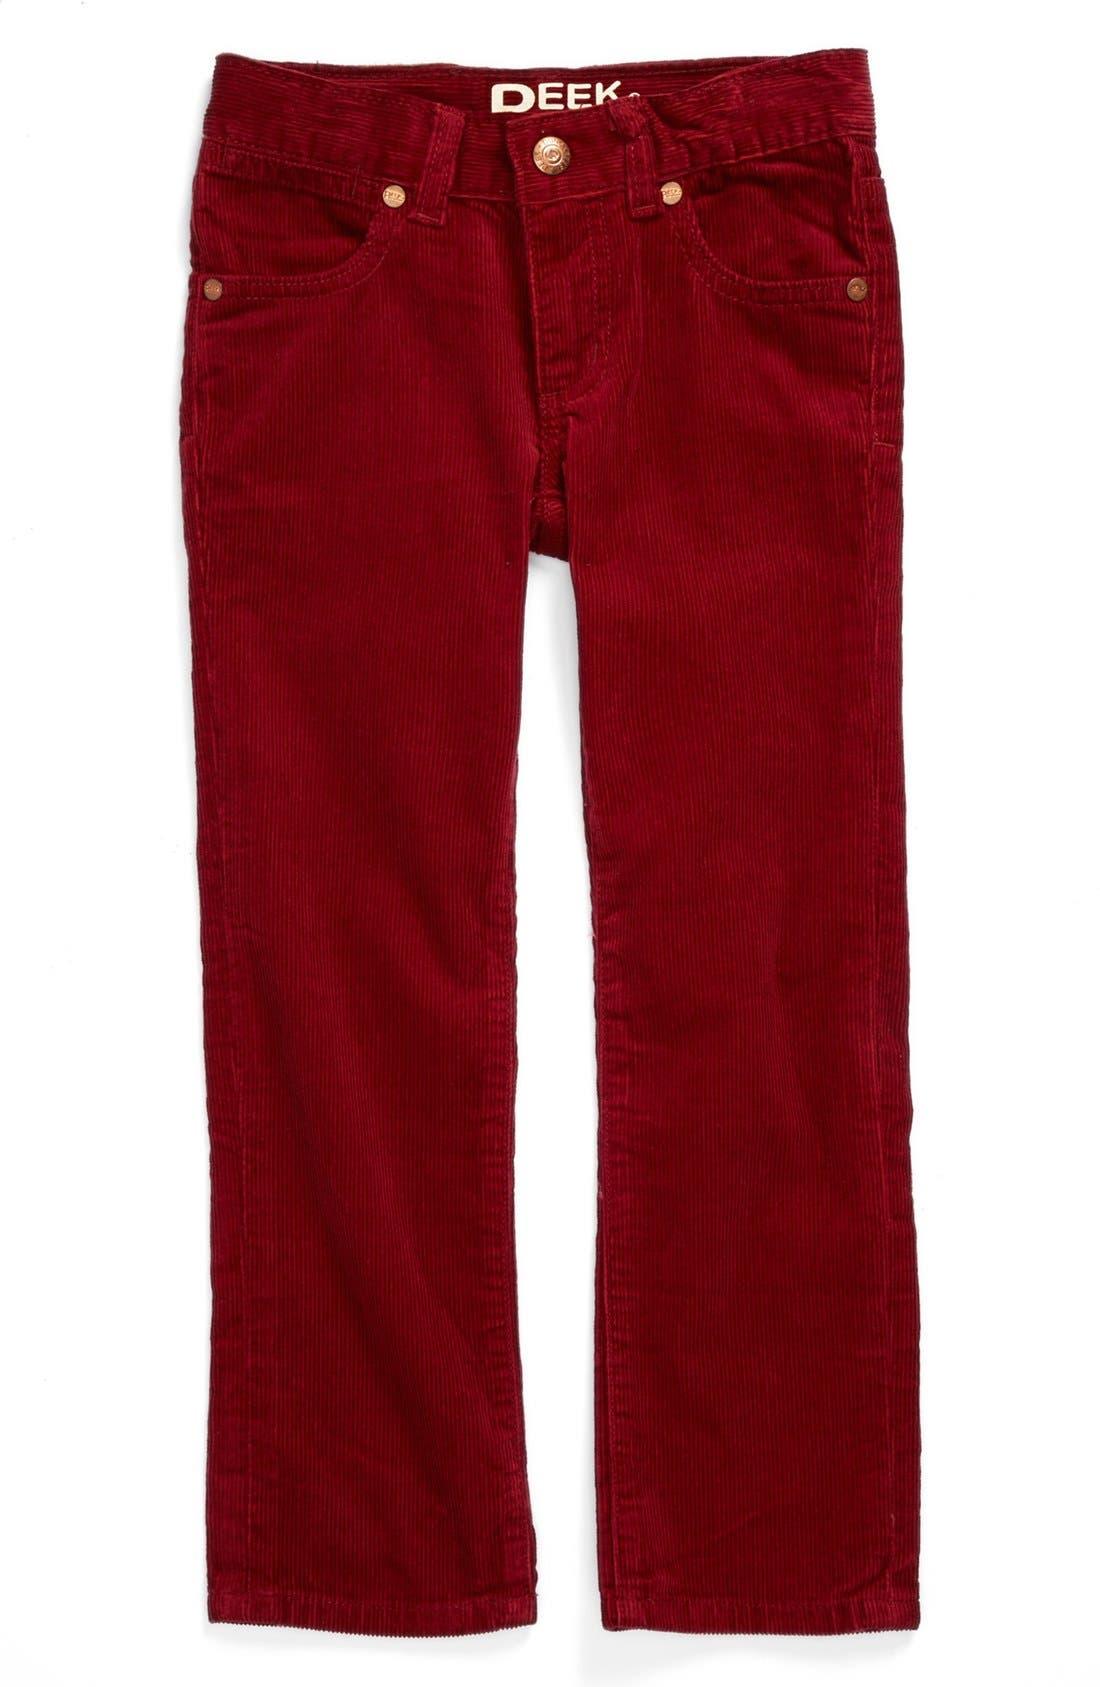 Alternate Image 1 Selected - Peek Straight Leg Corduroy Pants (Baby Boys)